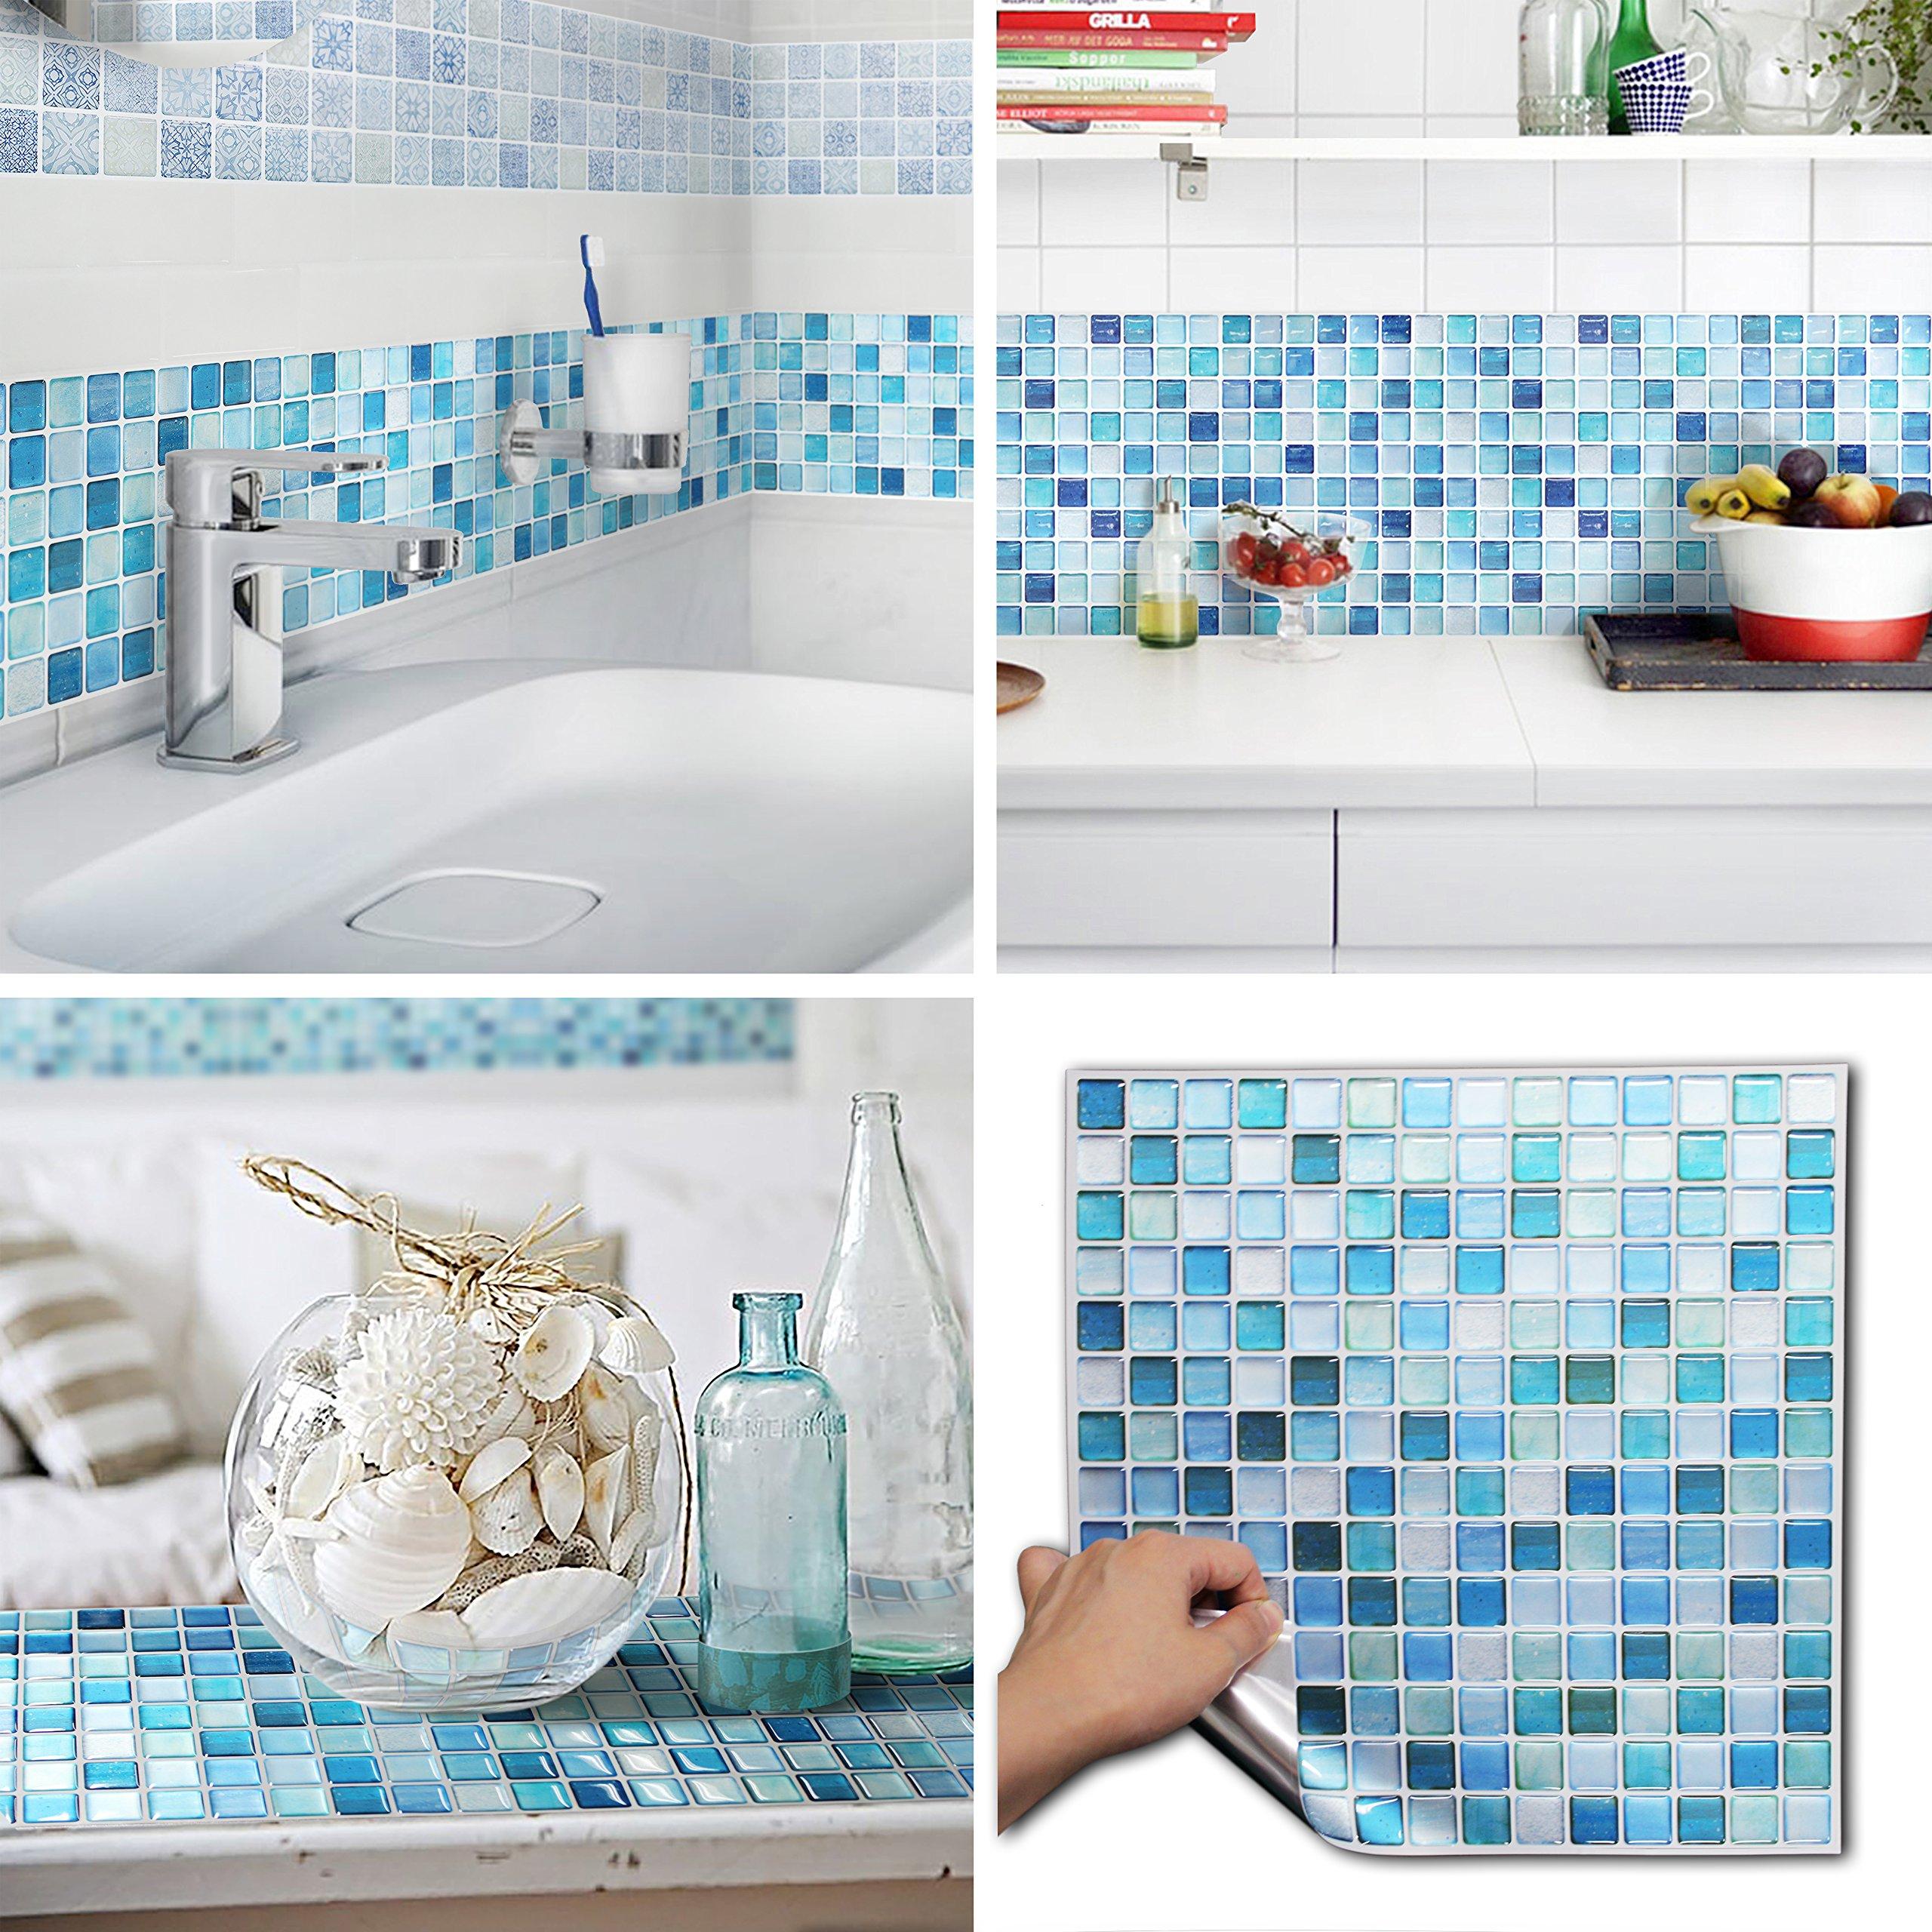 BEAUSTILE Decorative Tile Stickers Peel and Stick Backsplash Fire Retardant Tile Sheet (10pcs) (N.Blue)